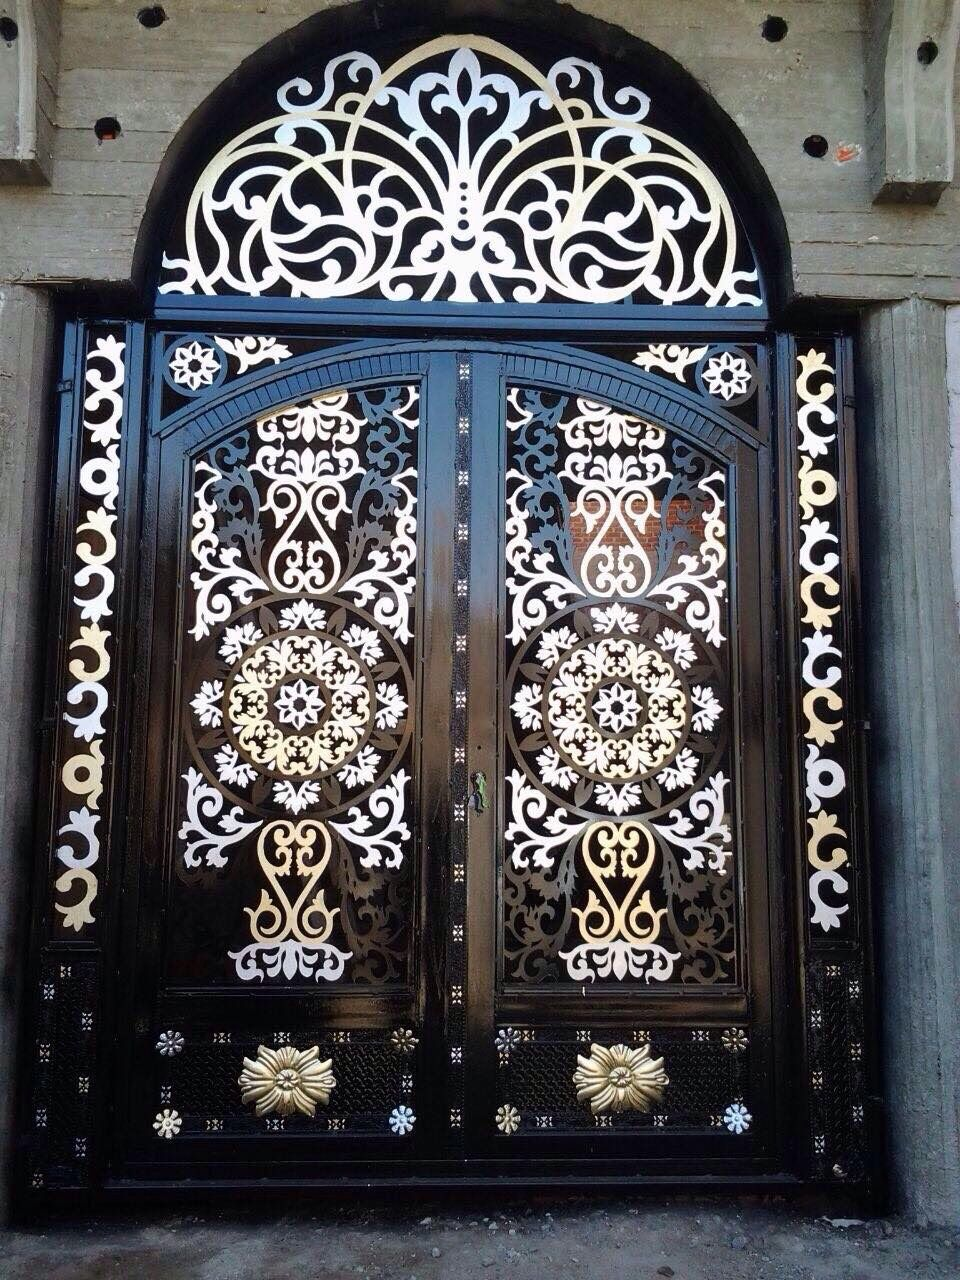 Carskij Starinnyj Kirpich Https Www Ruskir Ru Ruchnoj Raboty S Obzhigom V Kolcevoj Pechi Gofmana Mozhete Stat Dilero Iron Doors Door Gate Design Unique Doors